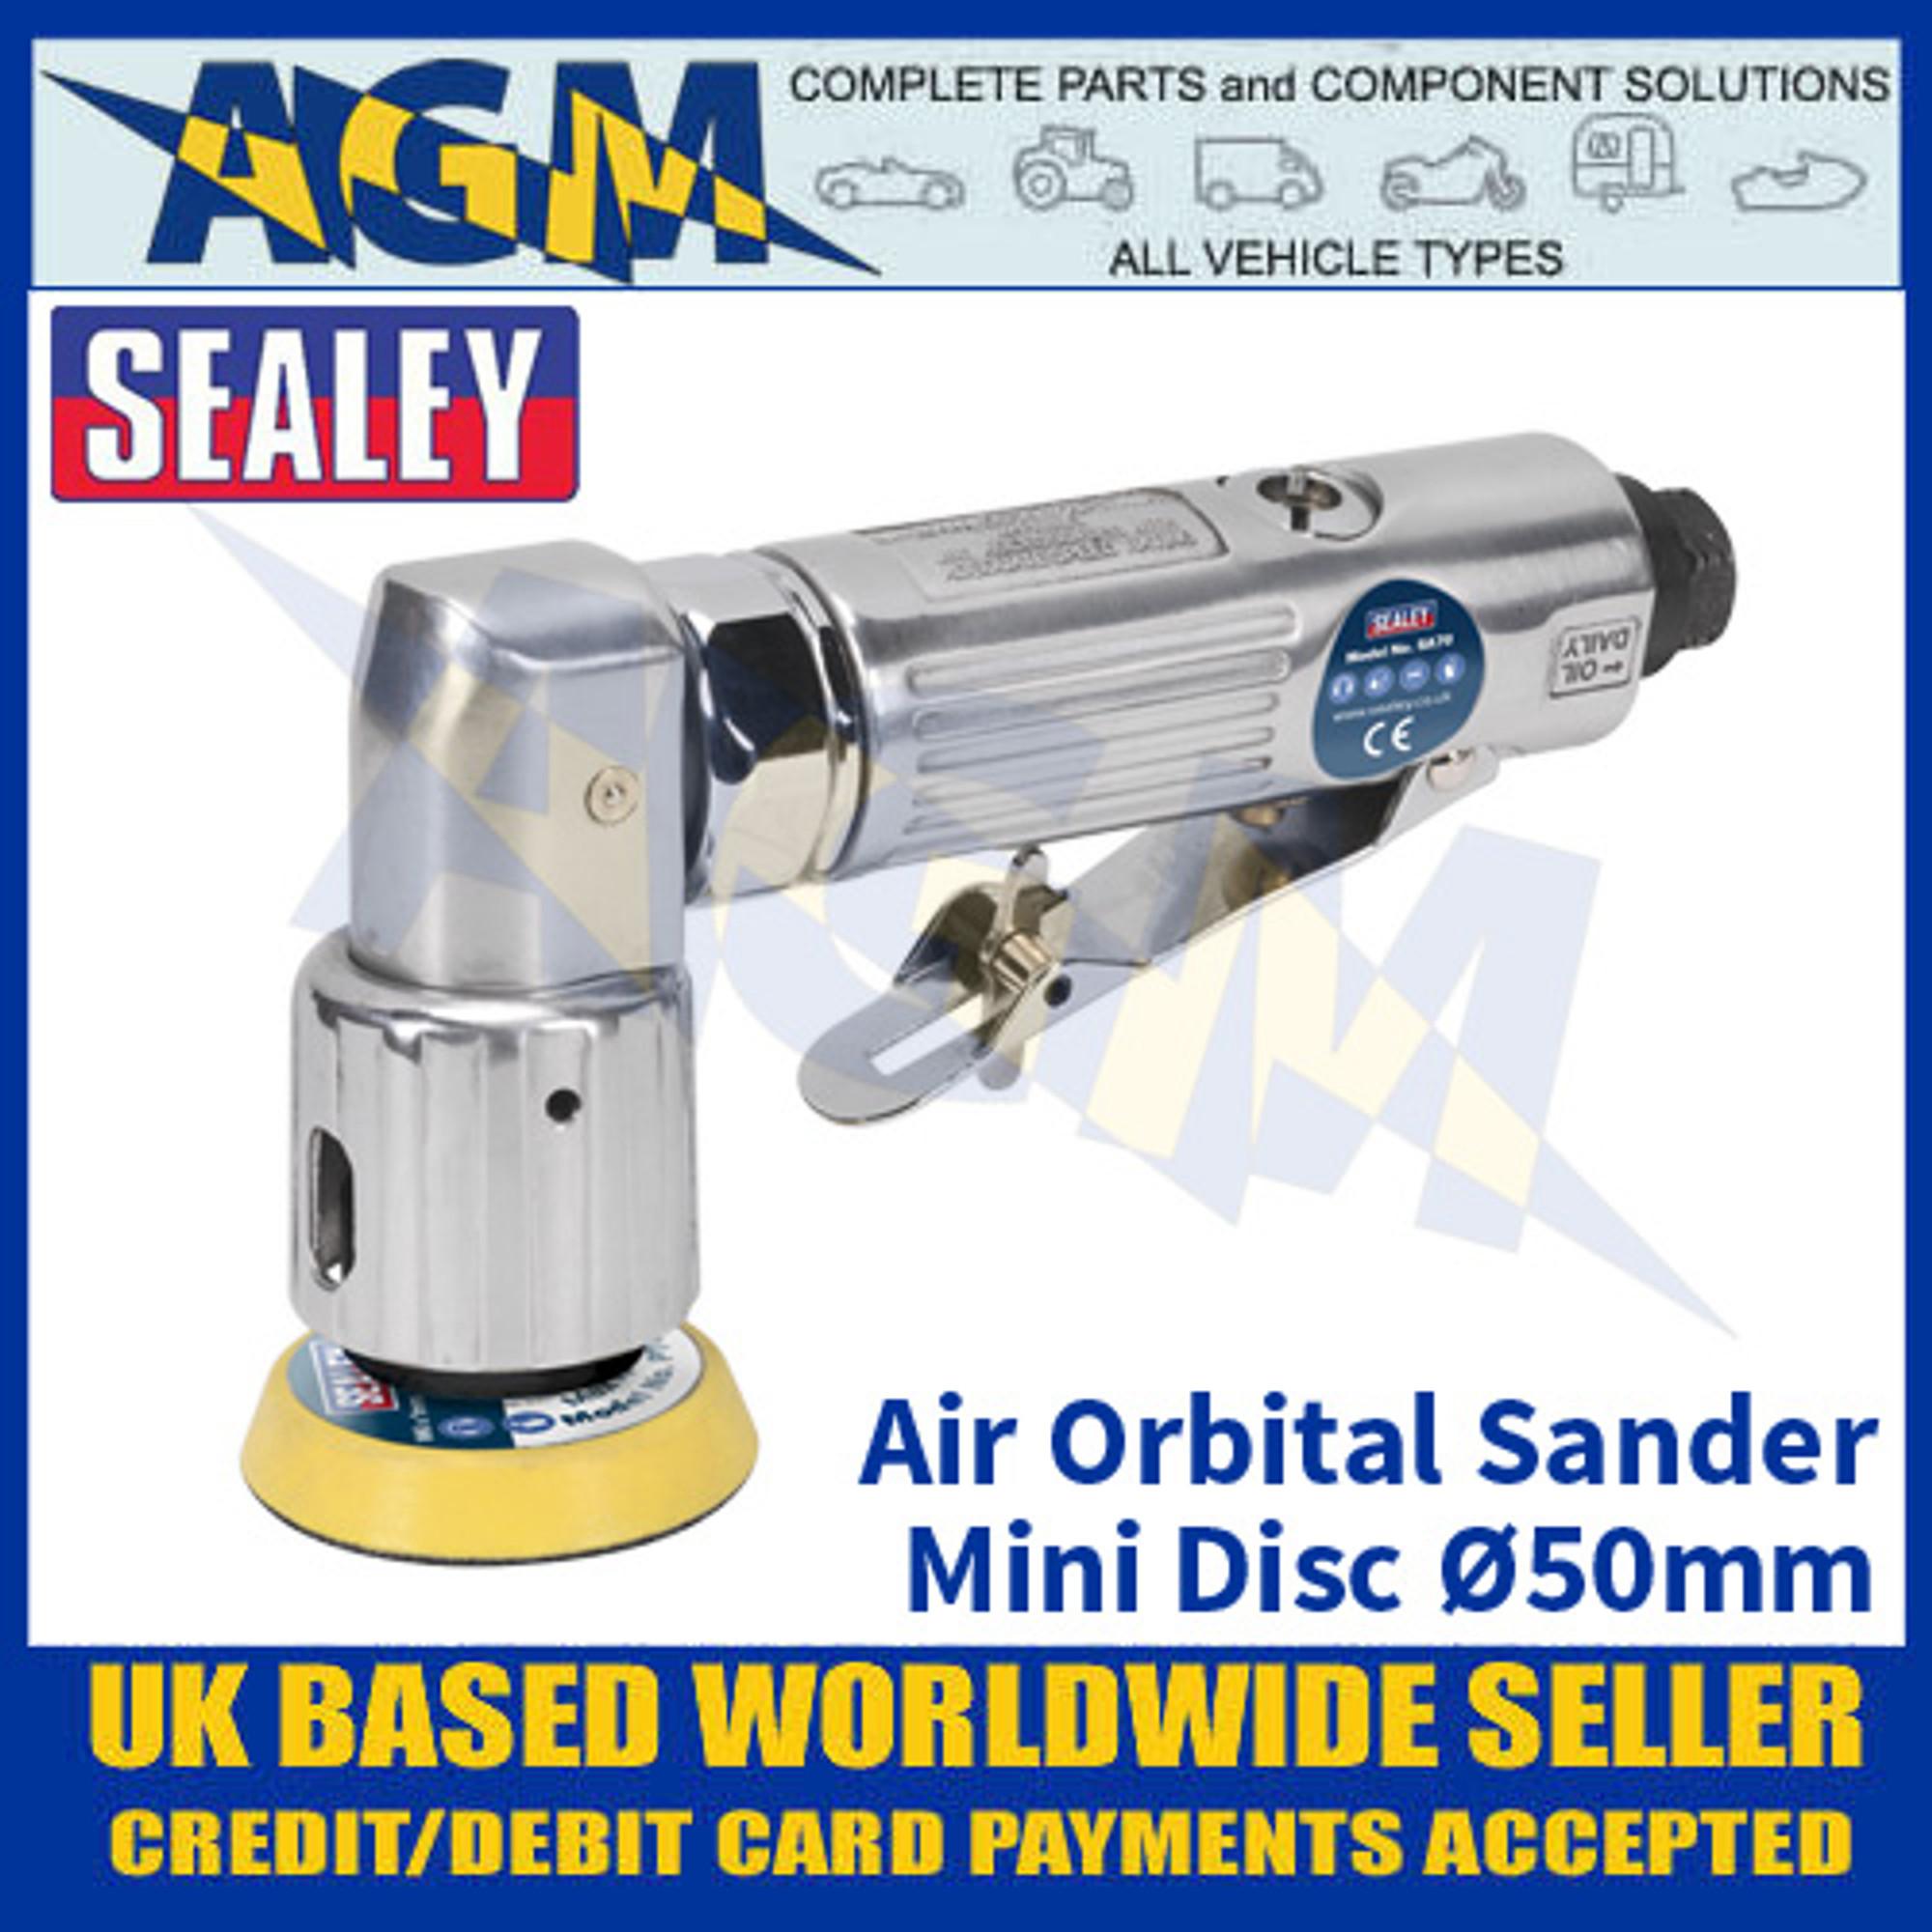 Sealey GSA70 /Ø50mm Mini Disc Air Orbital Sander